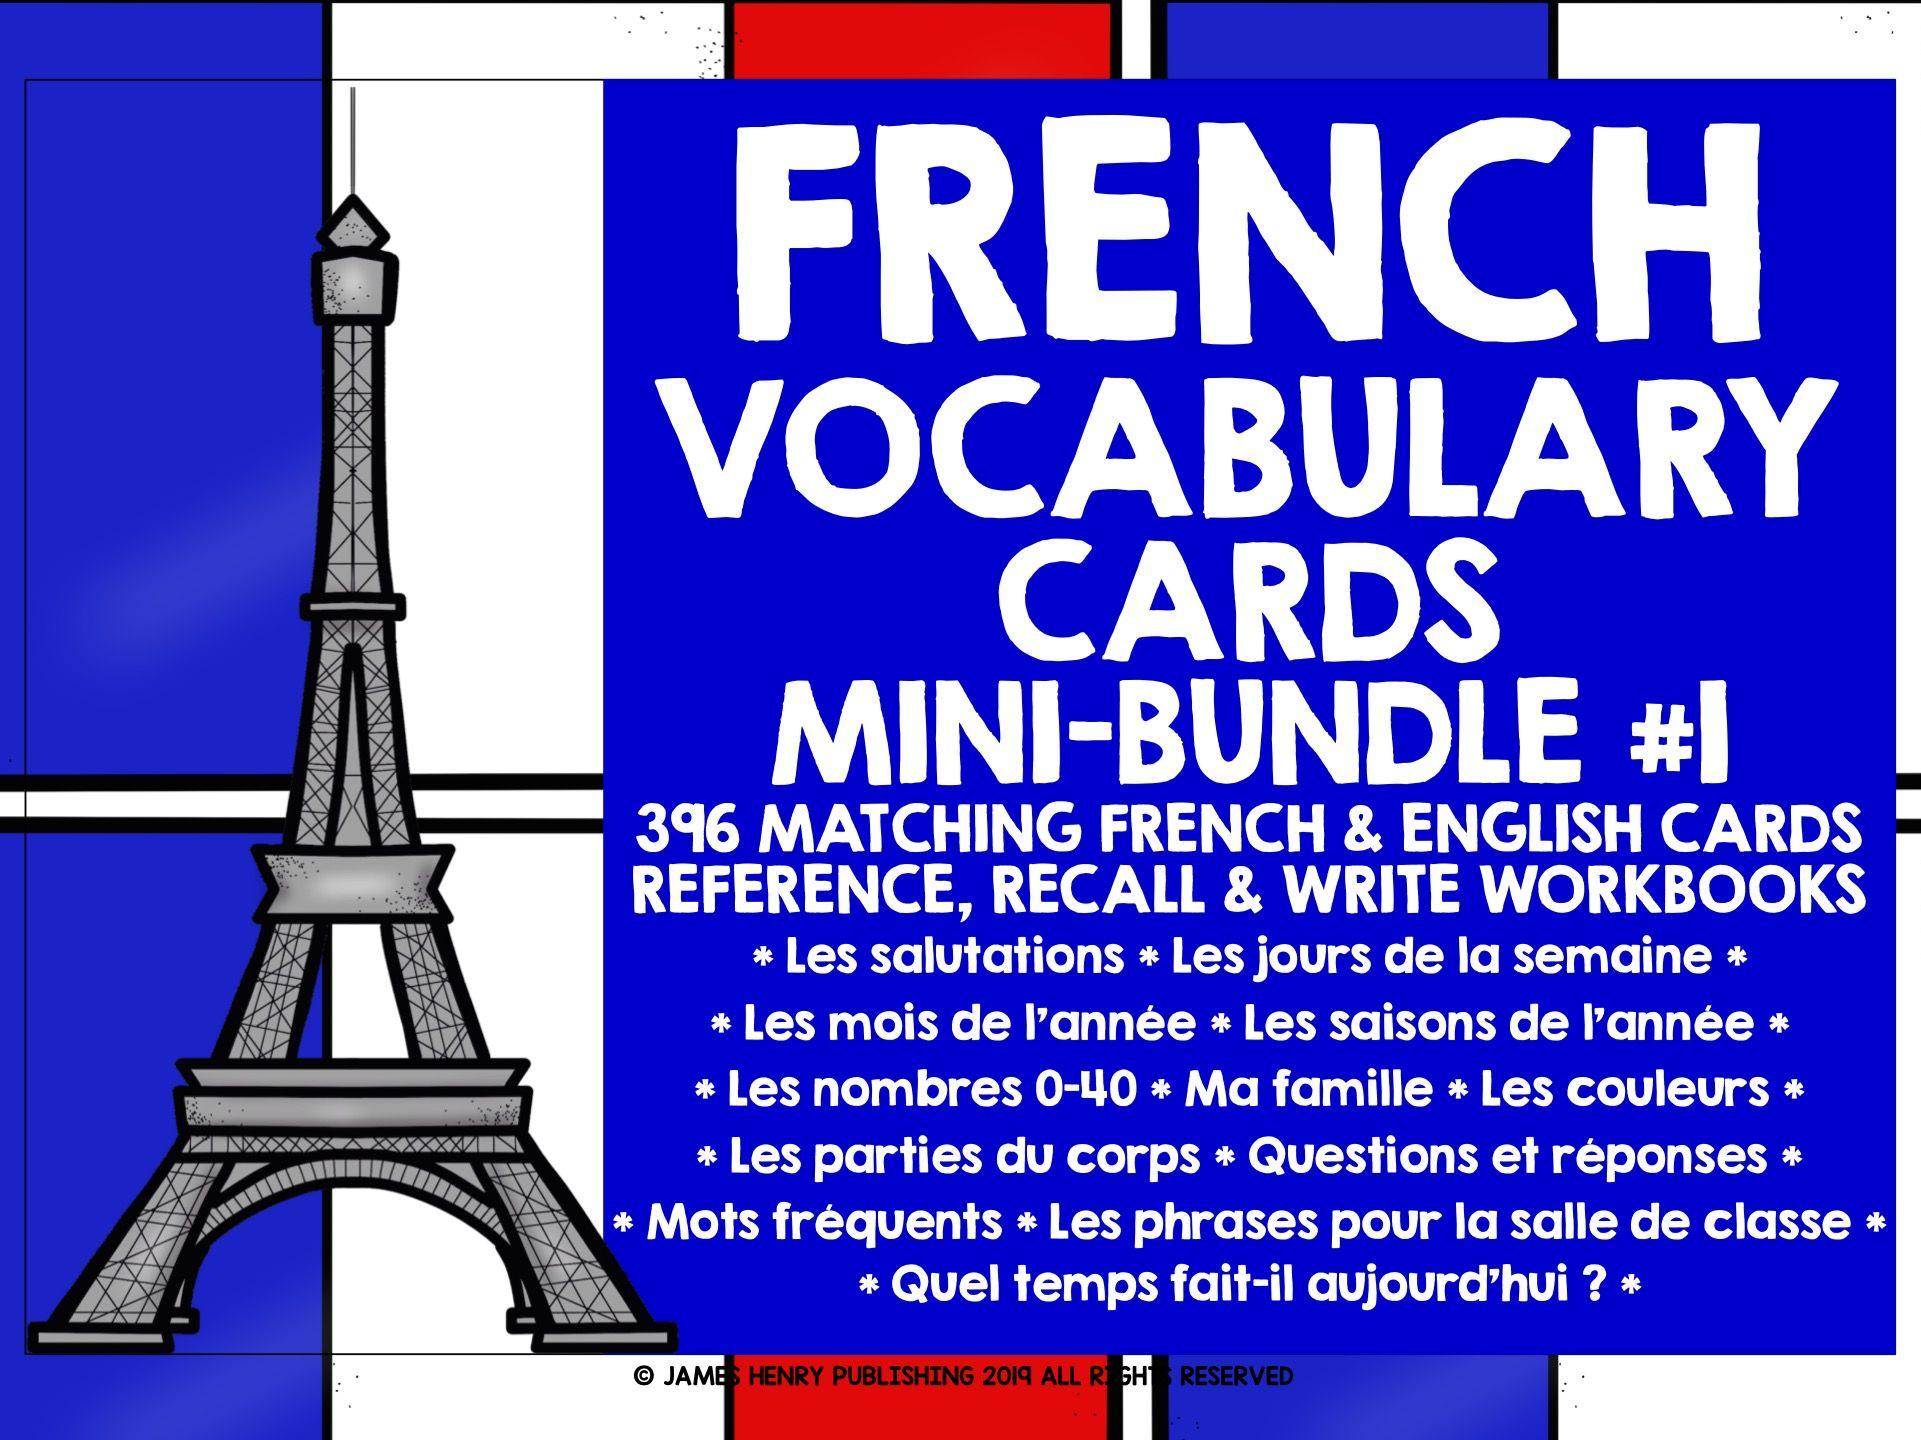 FRENCH VOCABULARY CARDS MINI-BUNDLE 1